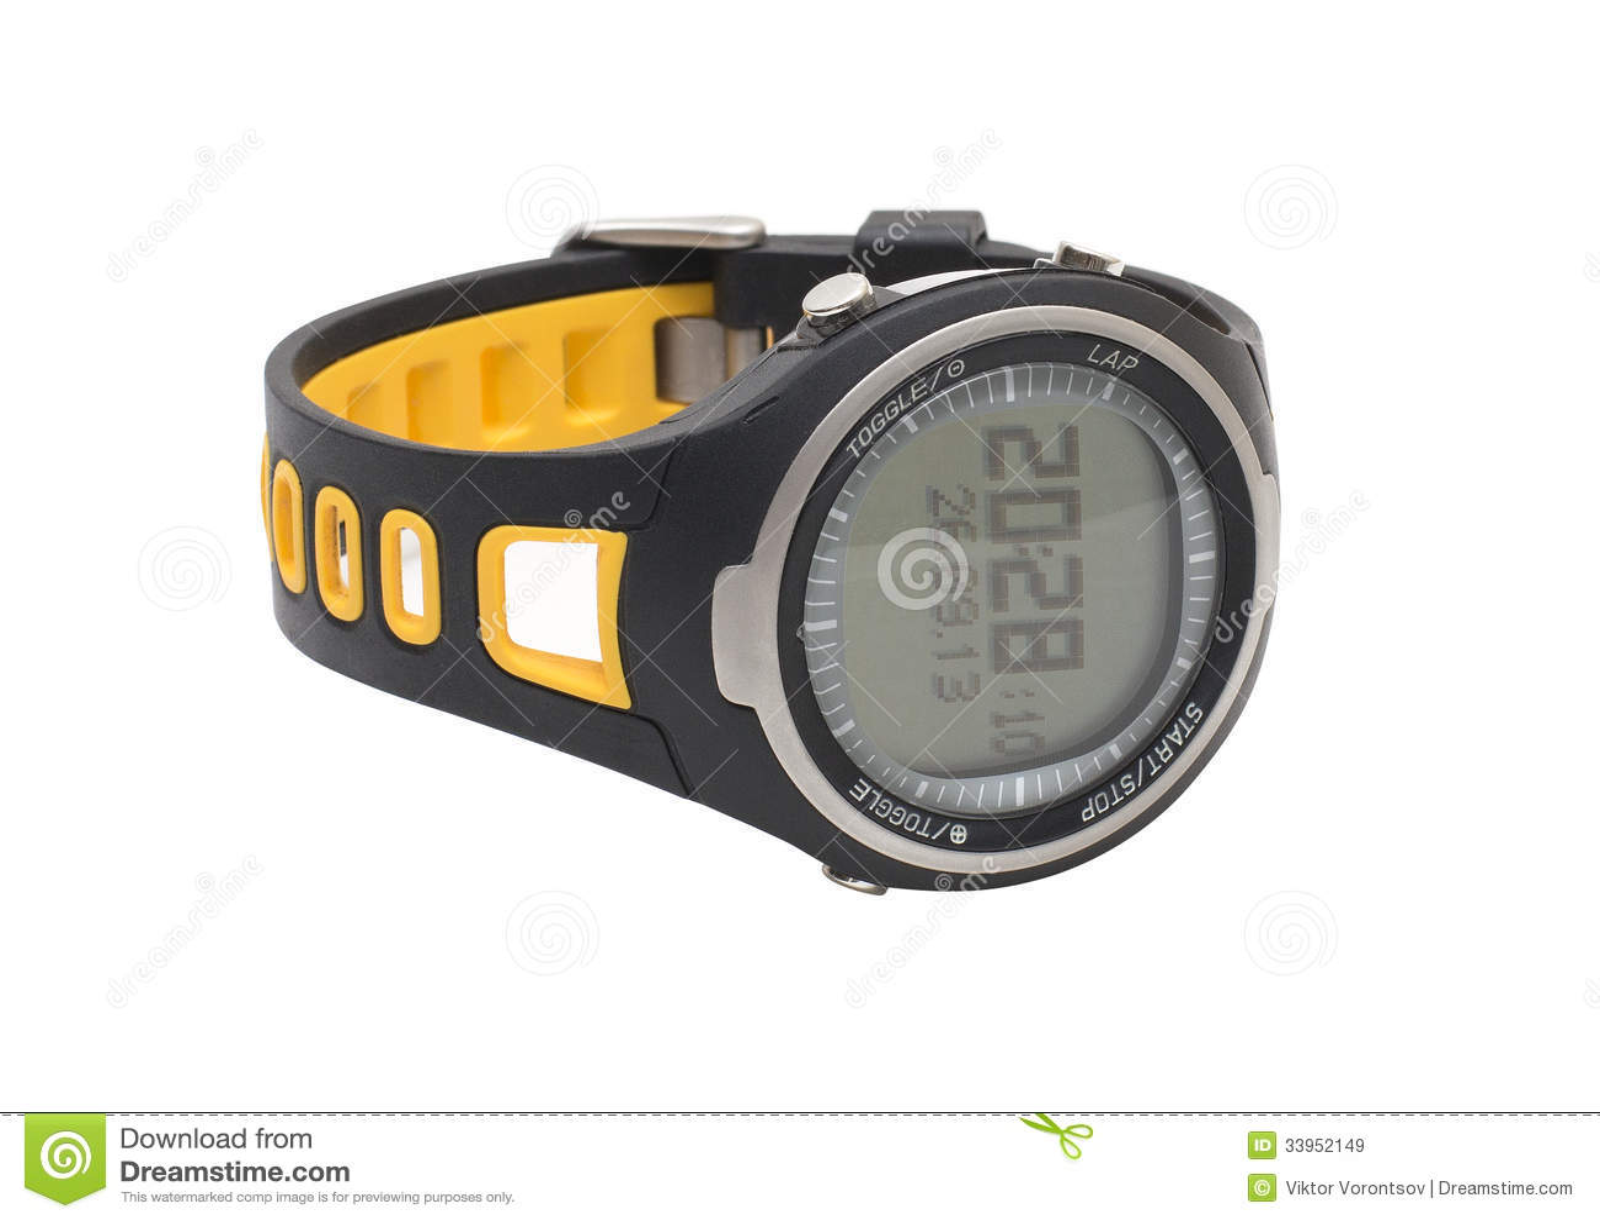 Pulsometer ρολόι αθλητικών χεριών που απομονώνεται στο λευκό